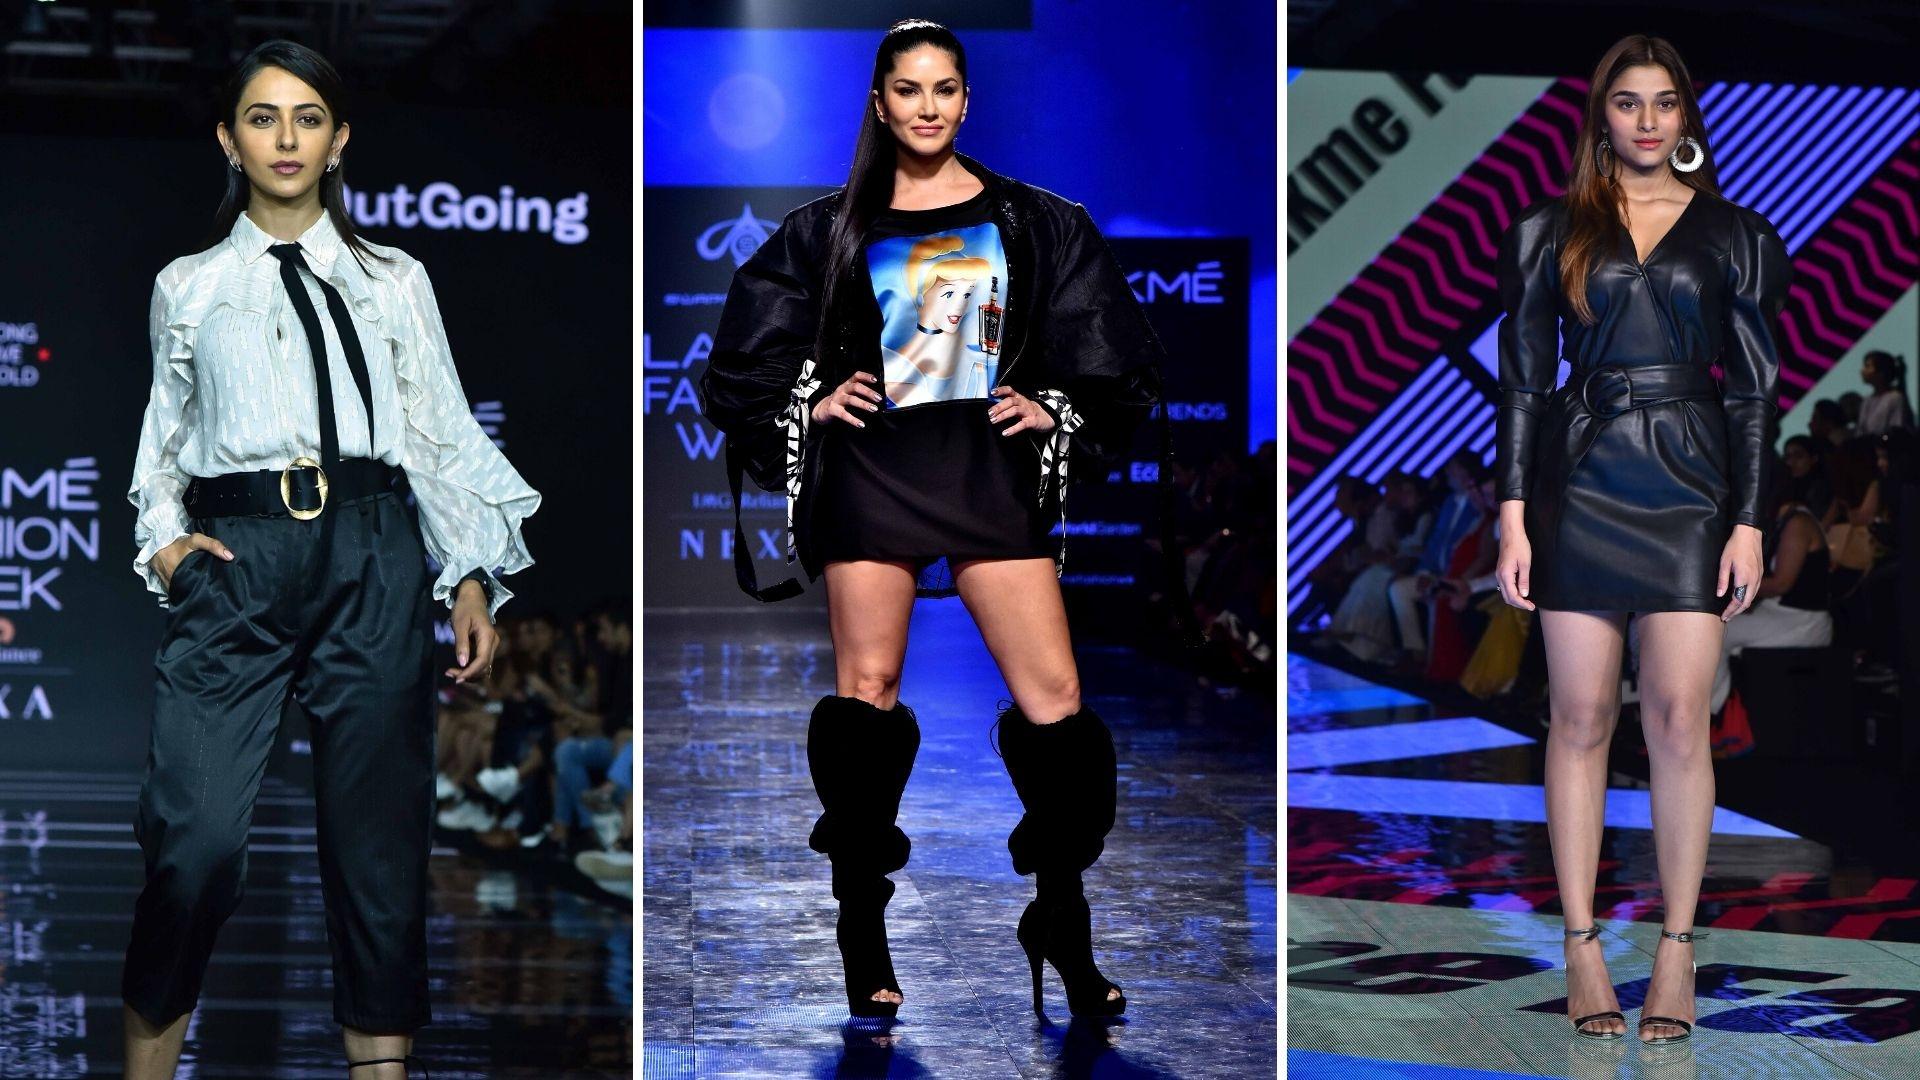 Lakme Fashion Week Day 1: Rakul Preet, Sunny Leone Rock the Stage